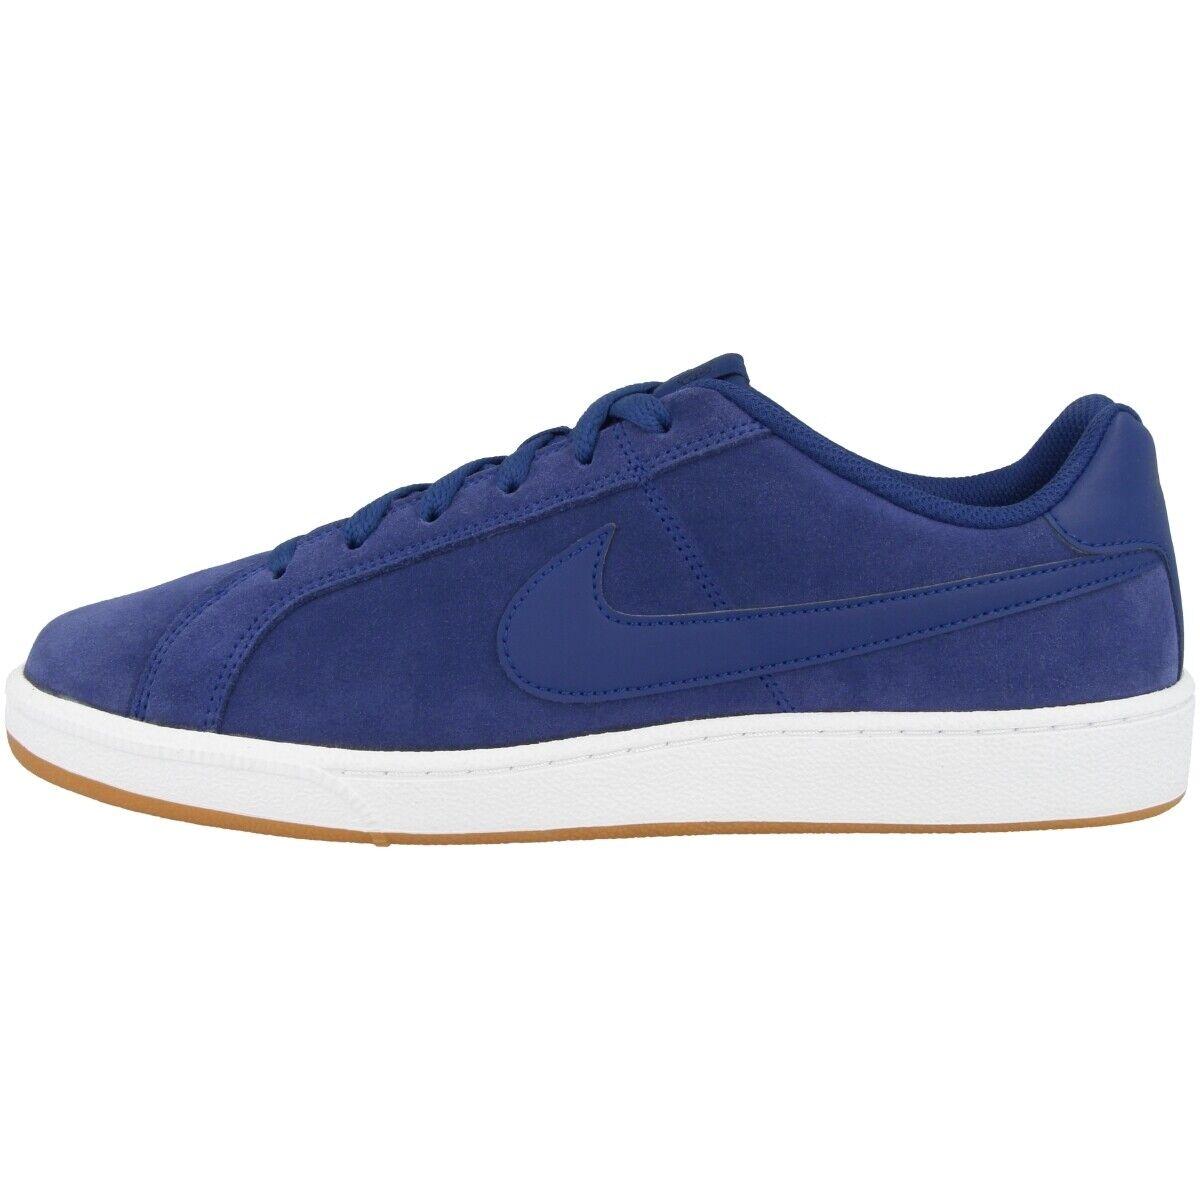 Nike Court Royale Suede chaussures Caleçon hommes Rétro Loisirs Turnchaussures bleu 819802-405